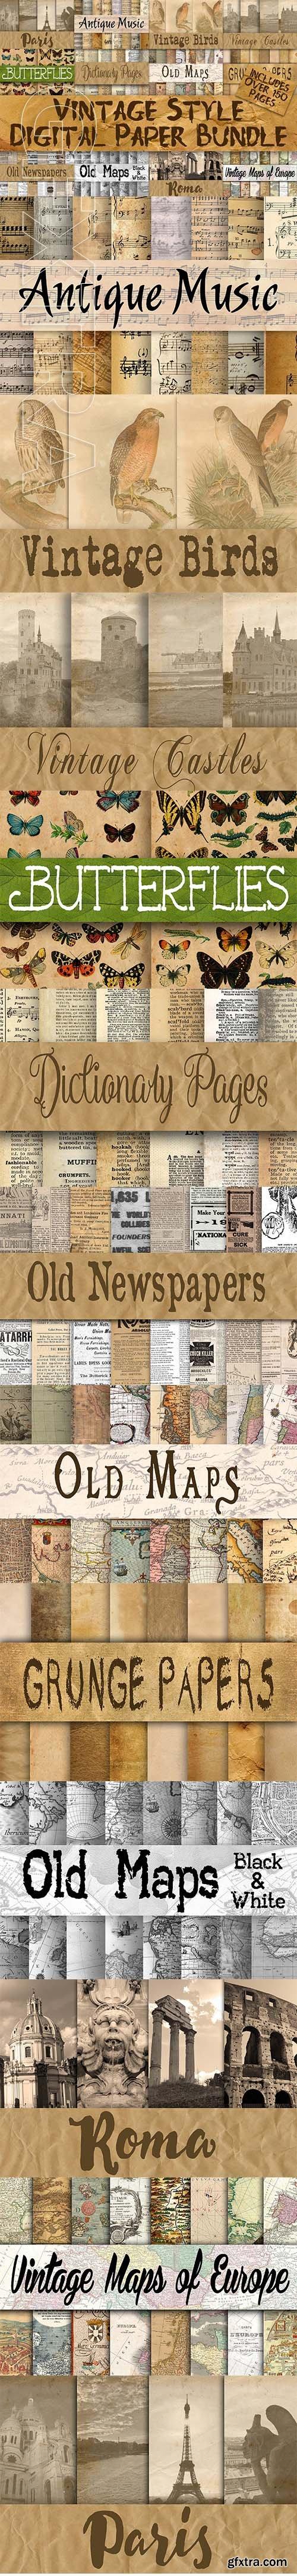 CreativeMarket - Vintage Style Digital Paper Bundle 2555823